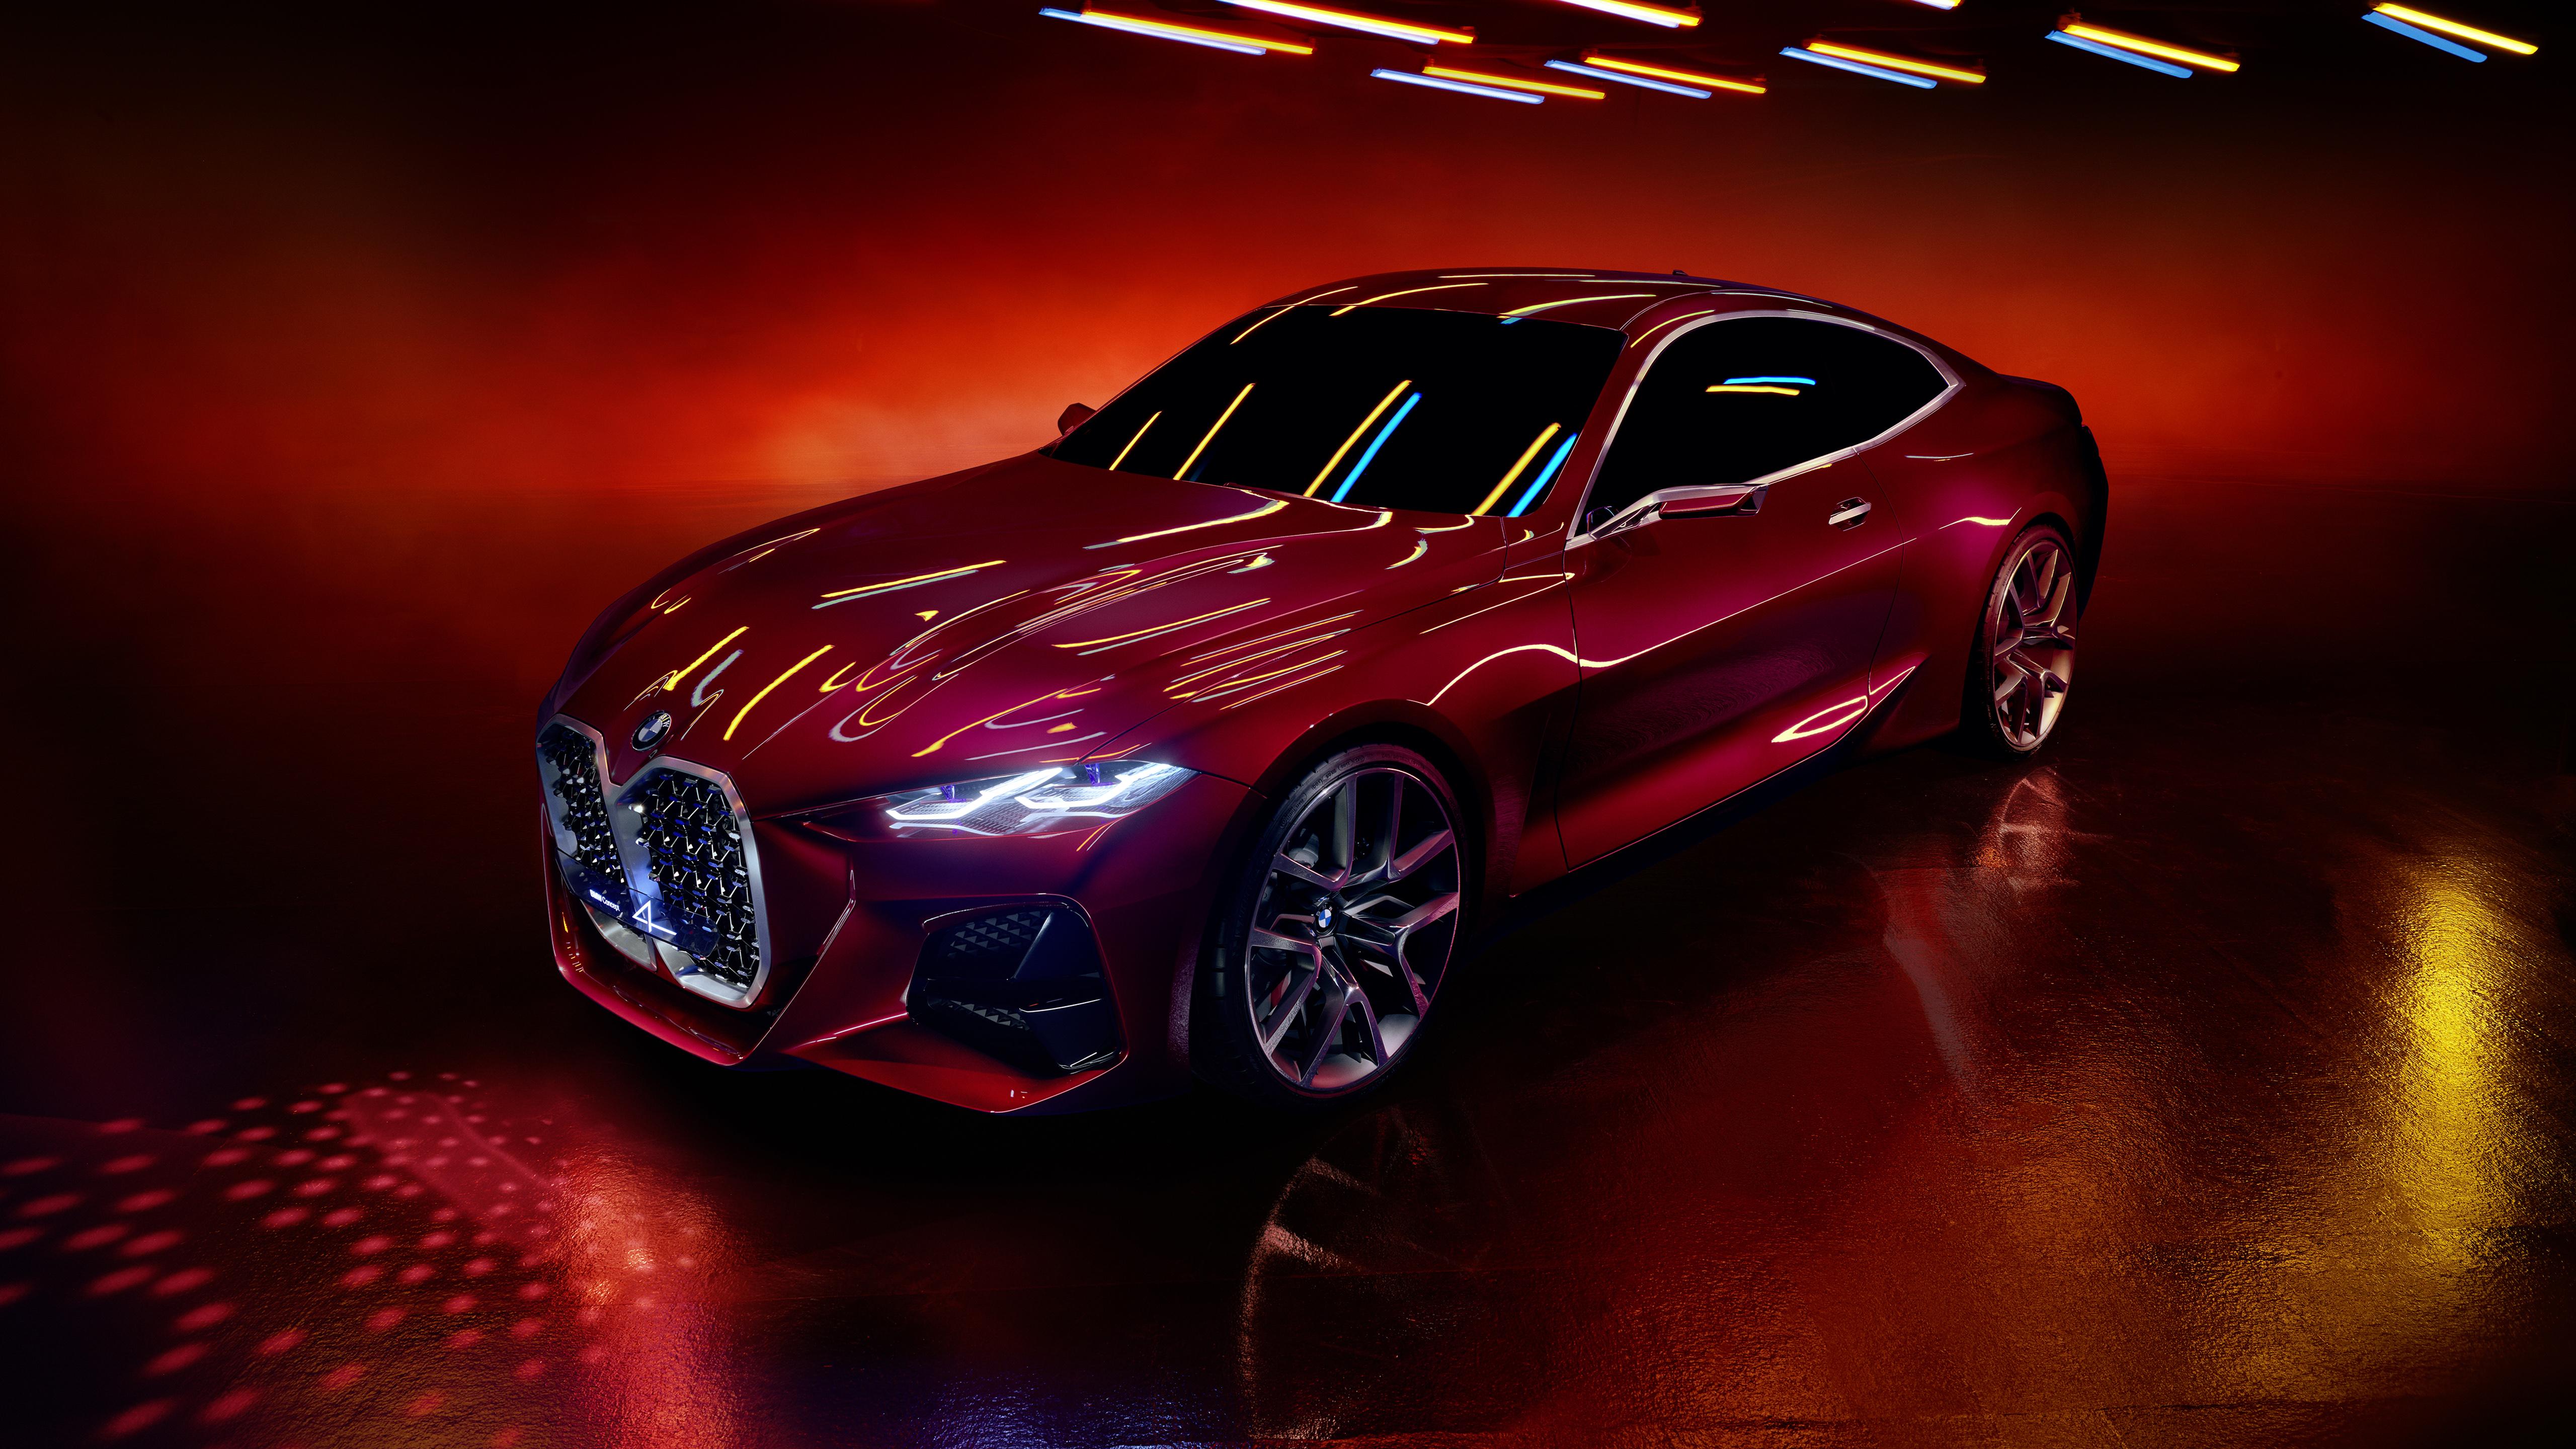 BMW Concept 4 2019 4K Wallpaper | HD Car Wallpapers | ID ...